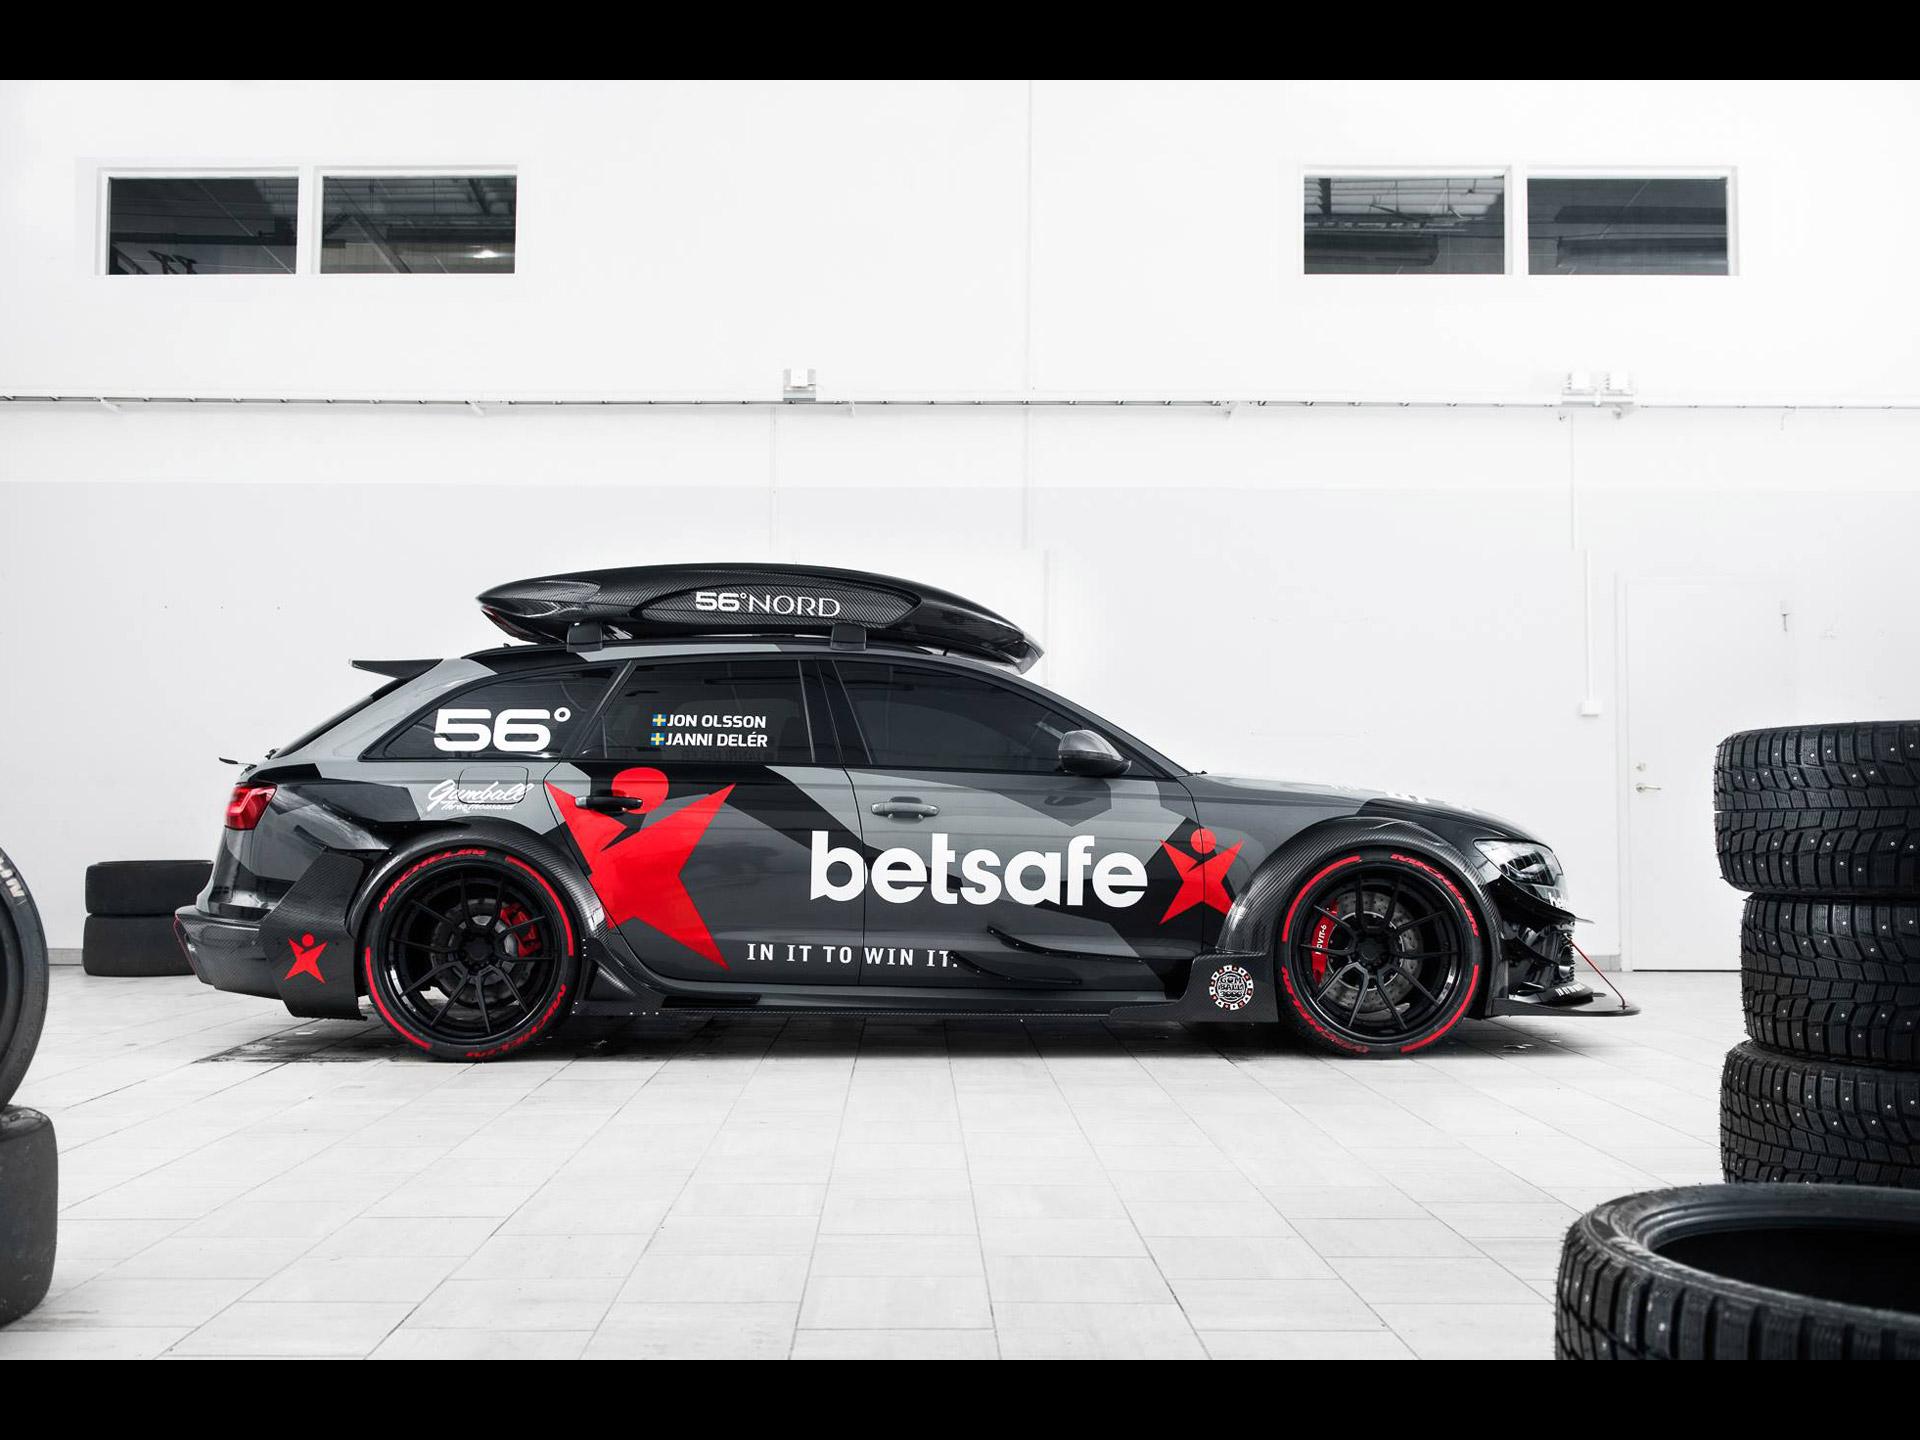 Audi Rs 6 Avant Quot Rs6 Dtm Quot 2015 アウディに嵌まる 壁紙画像ブログ